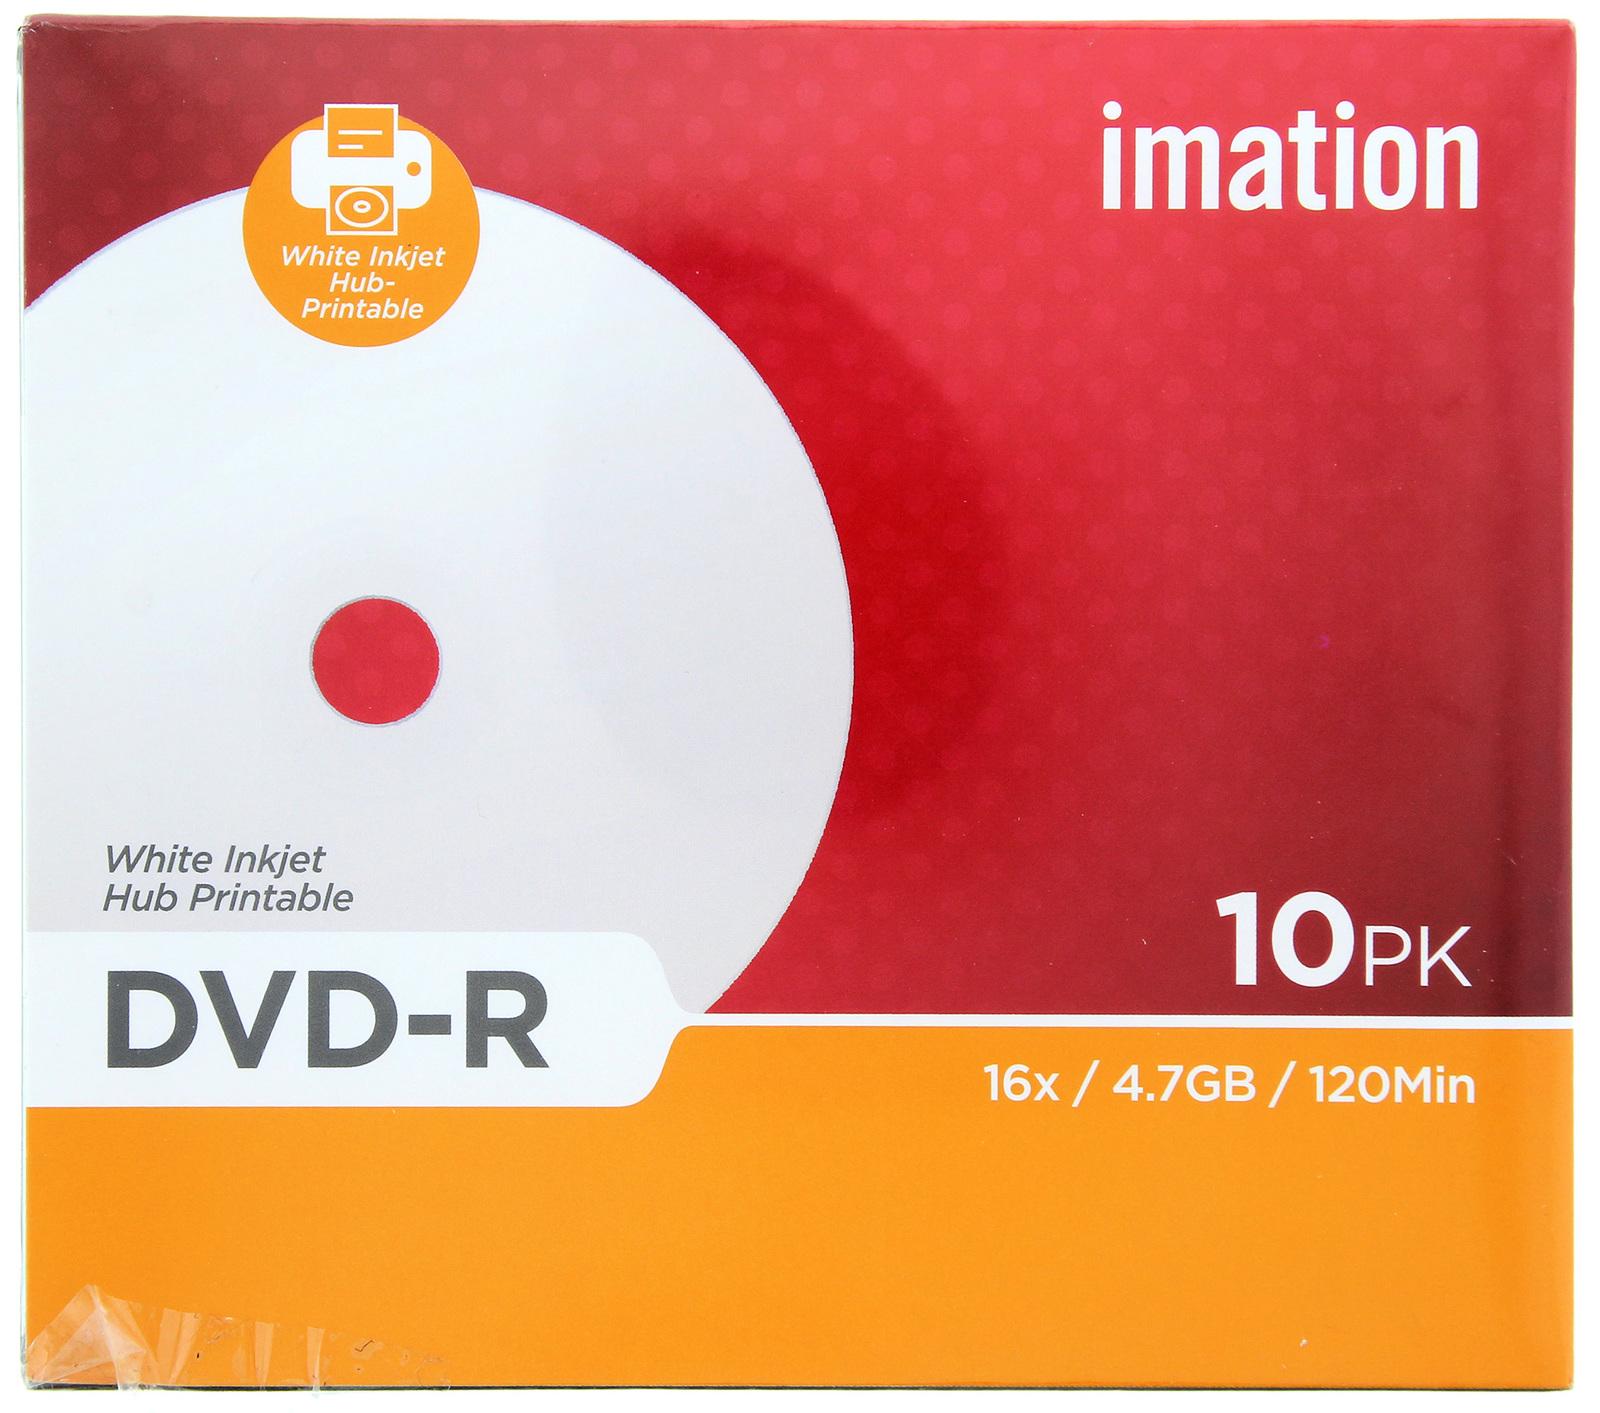 Imation Printable DVD-R 4.7GB 16X 10PK SLIM JEWEL image